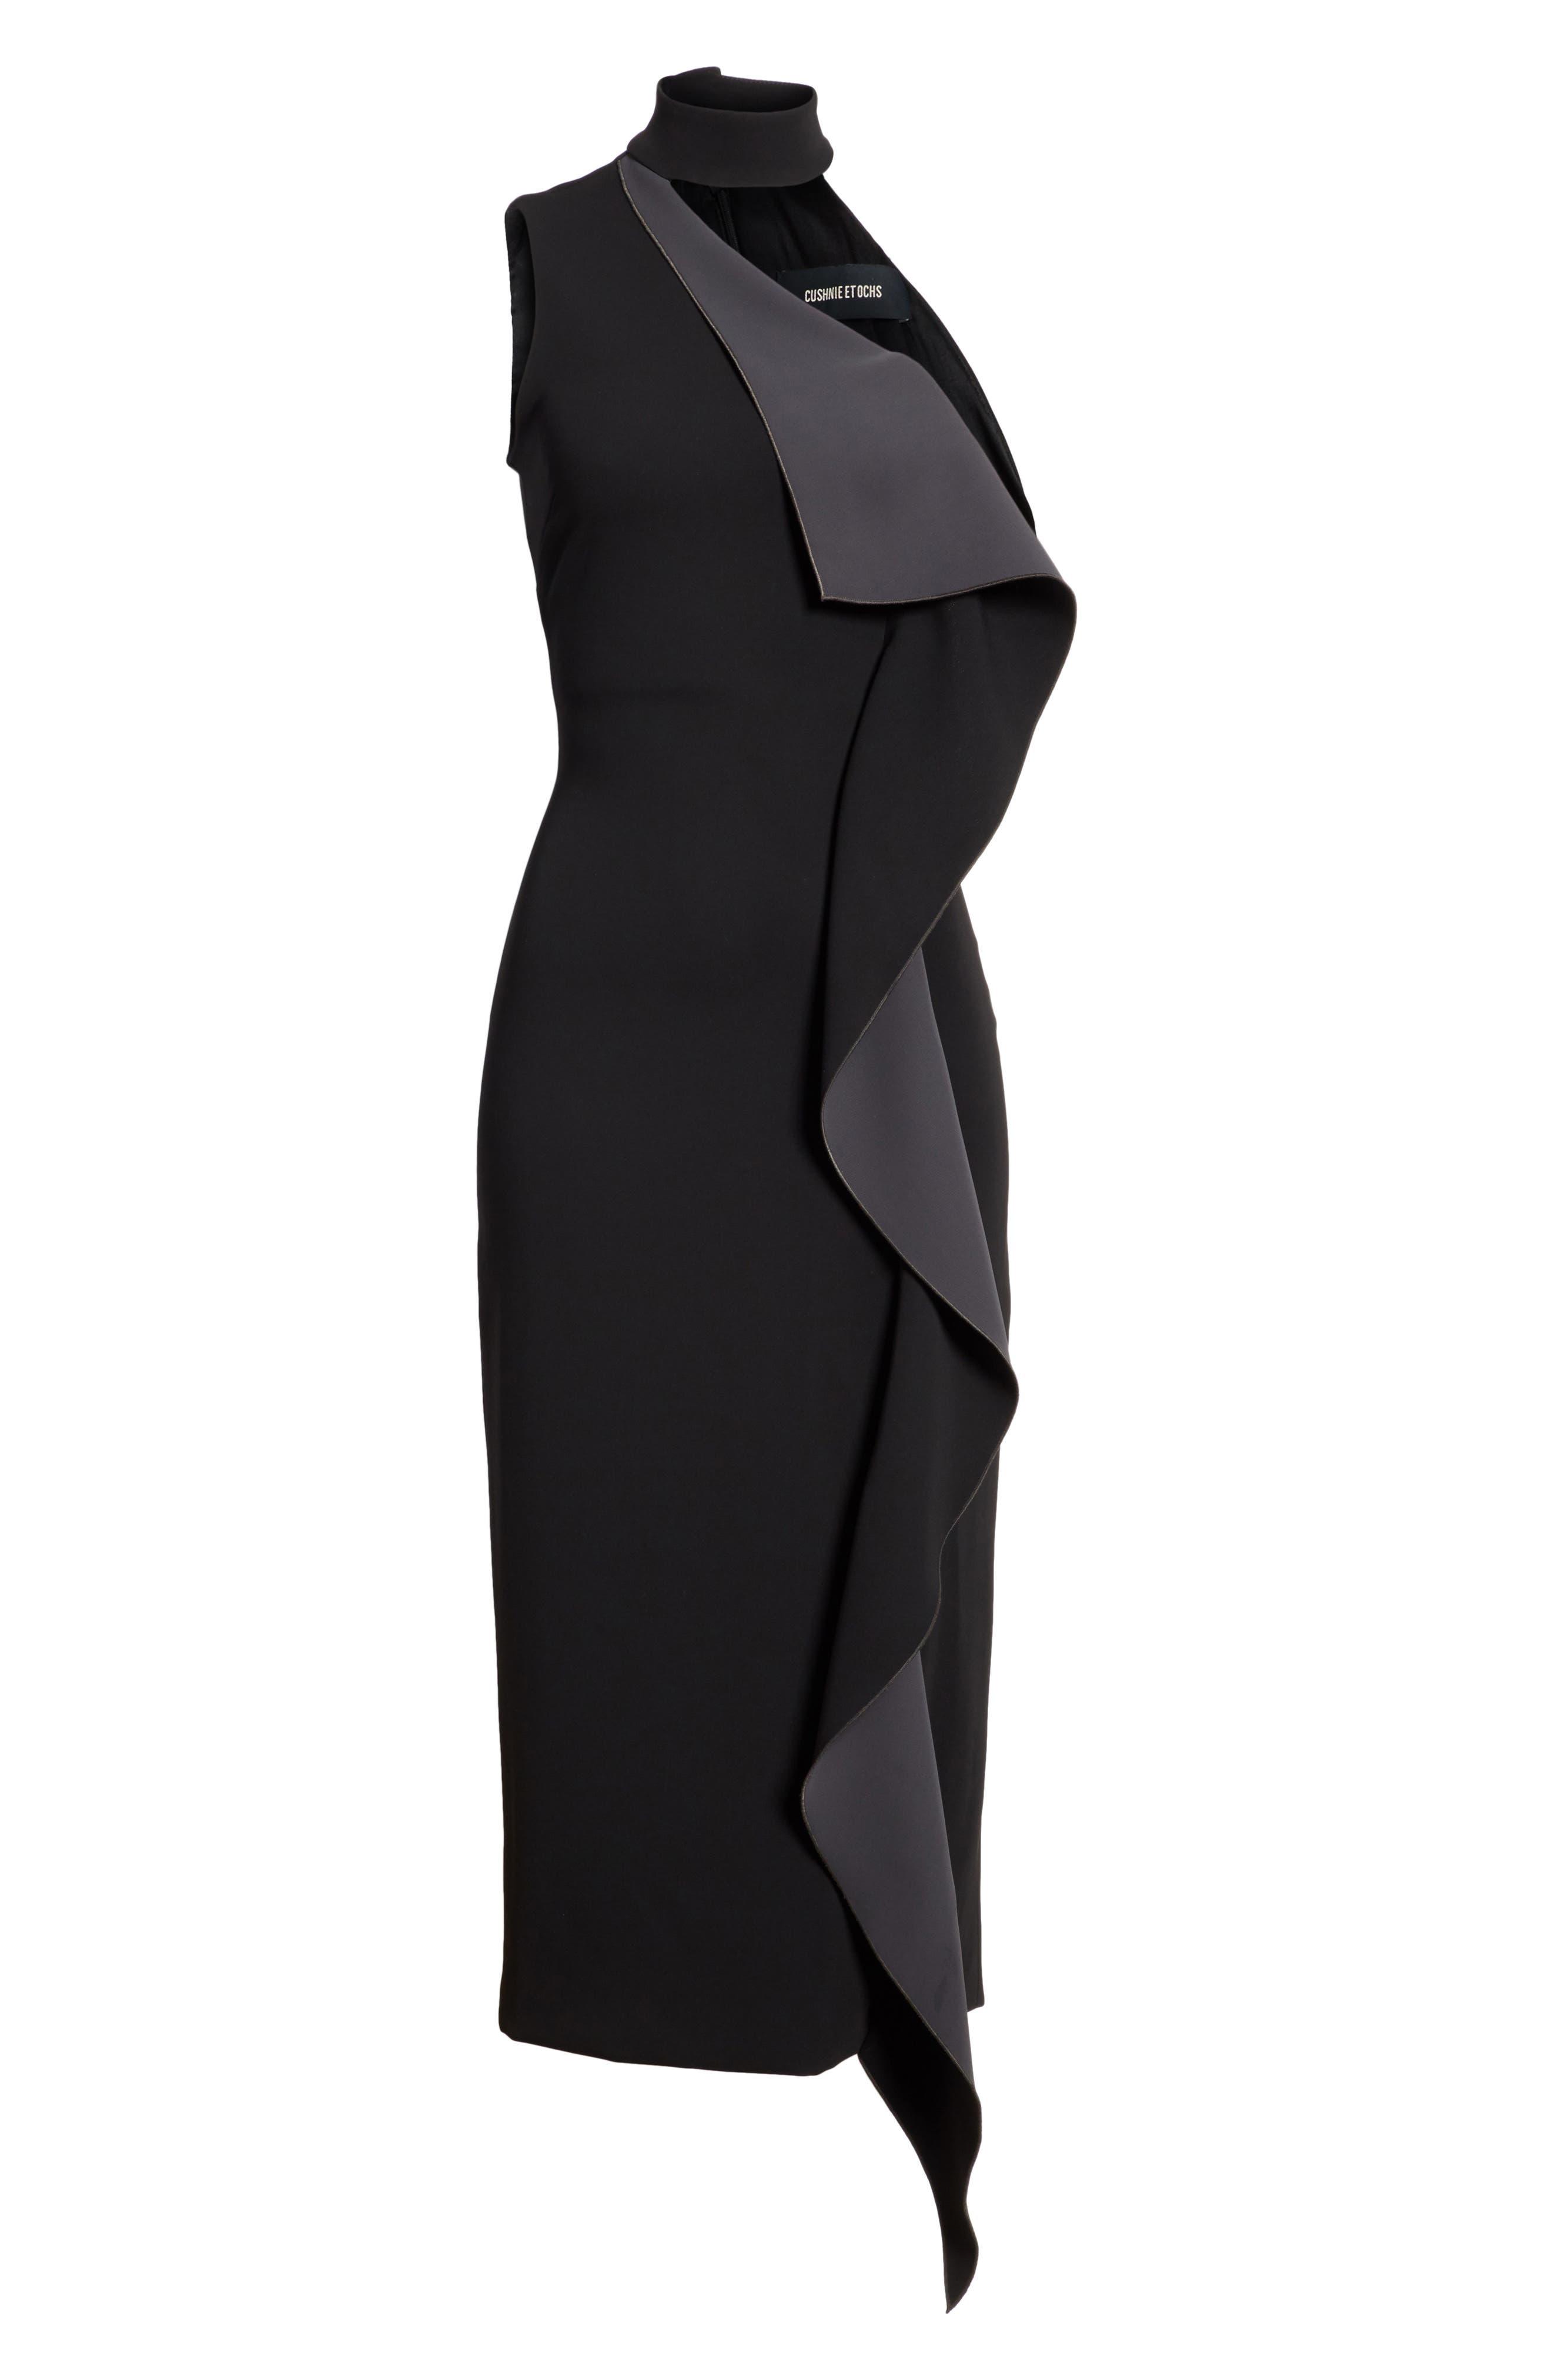 Elettra Ruffle Front Bonded Crepe Halter Dress,                             Alternate thumbnail 7, color,                             Black/ Graphite